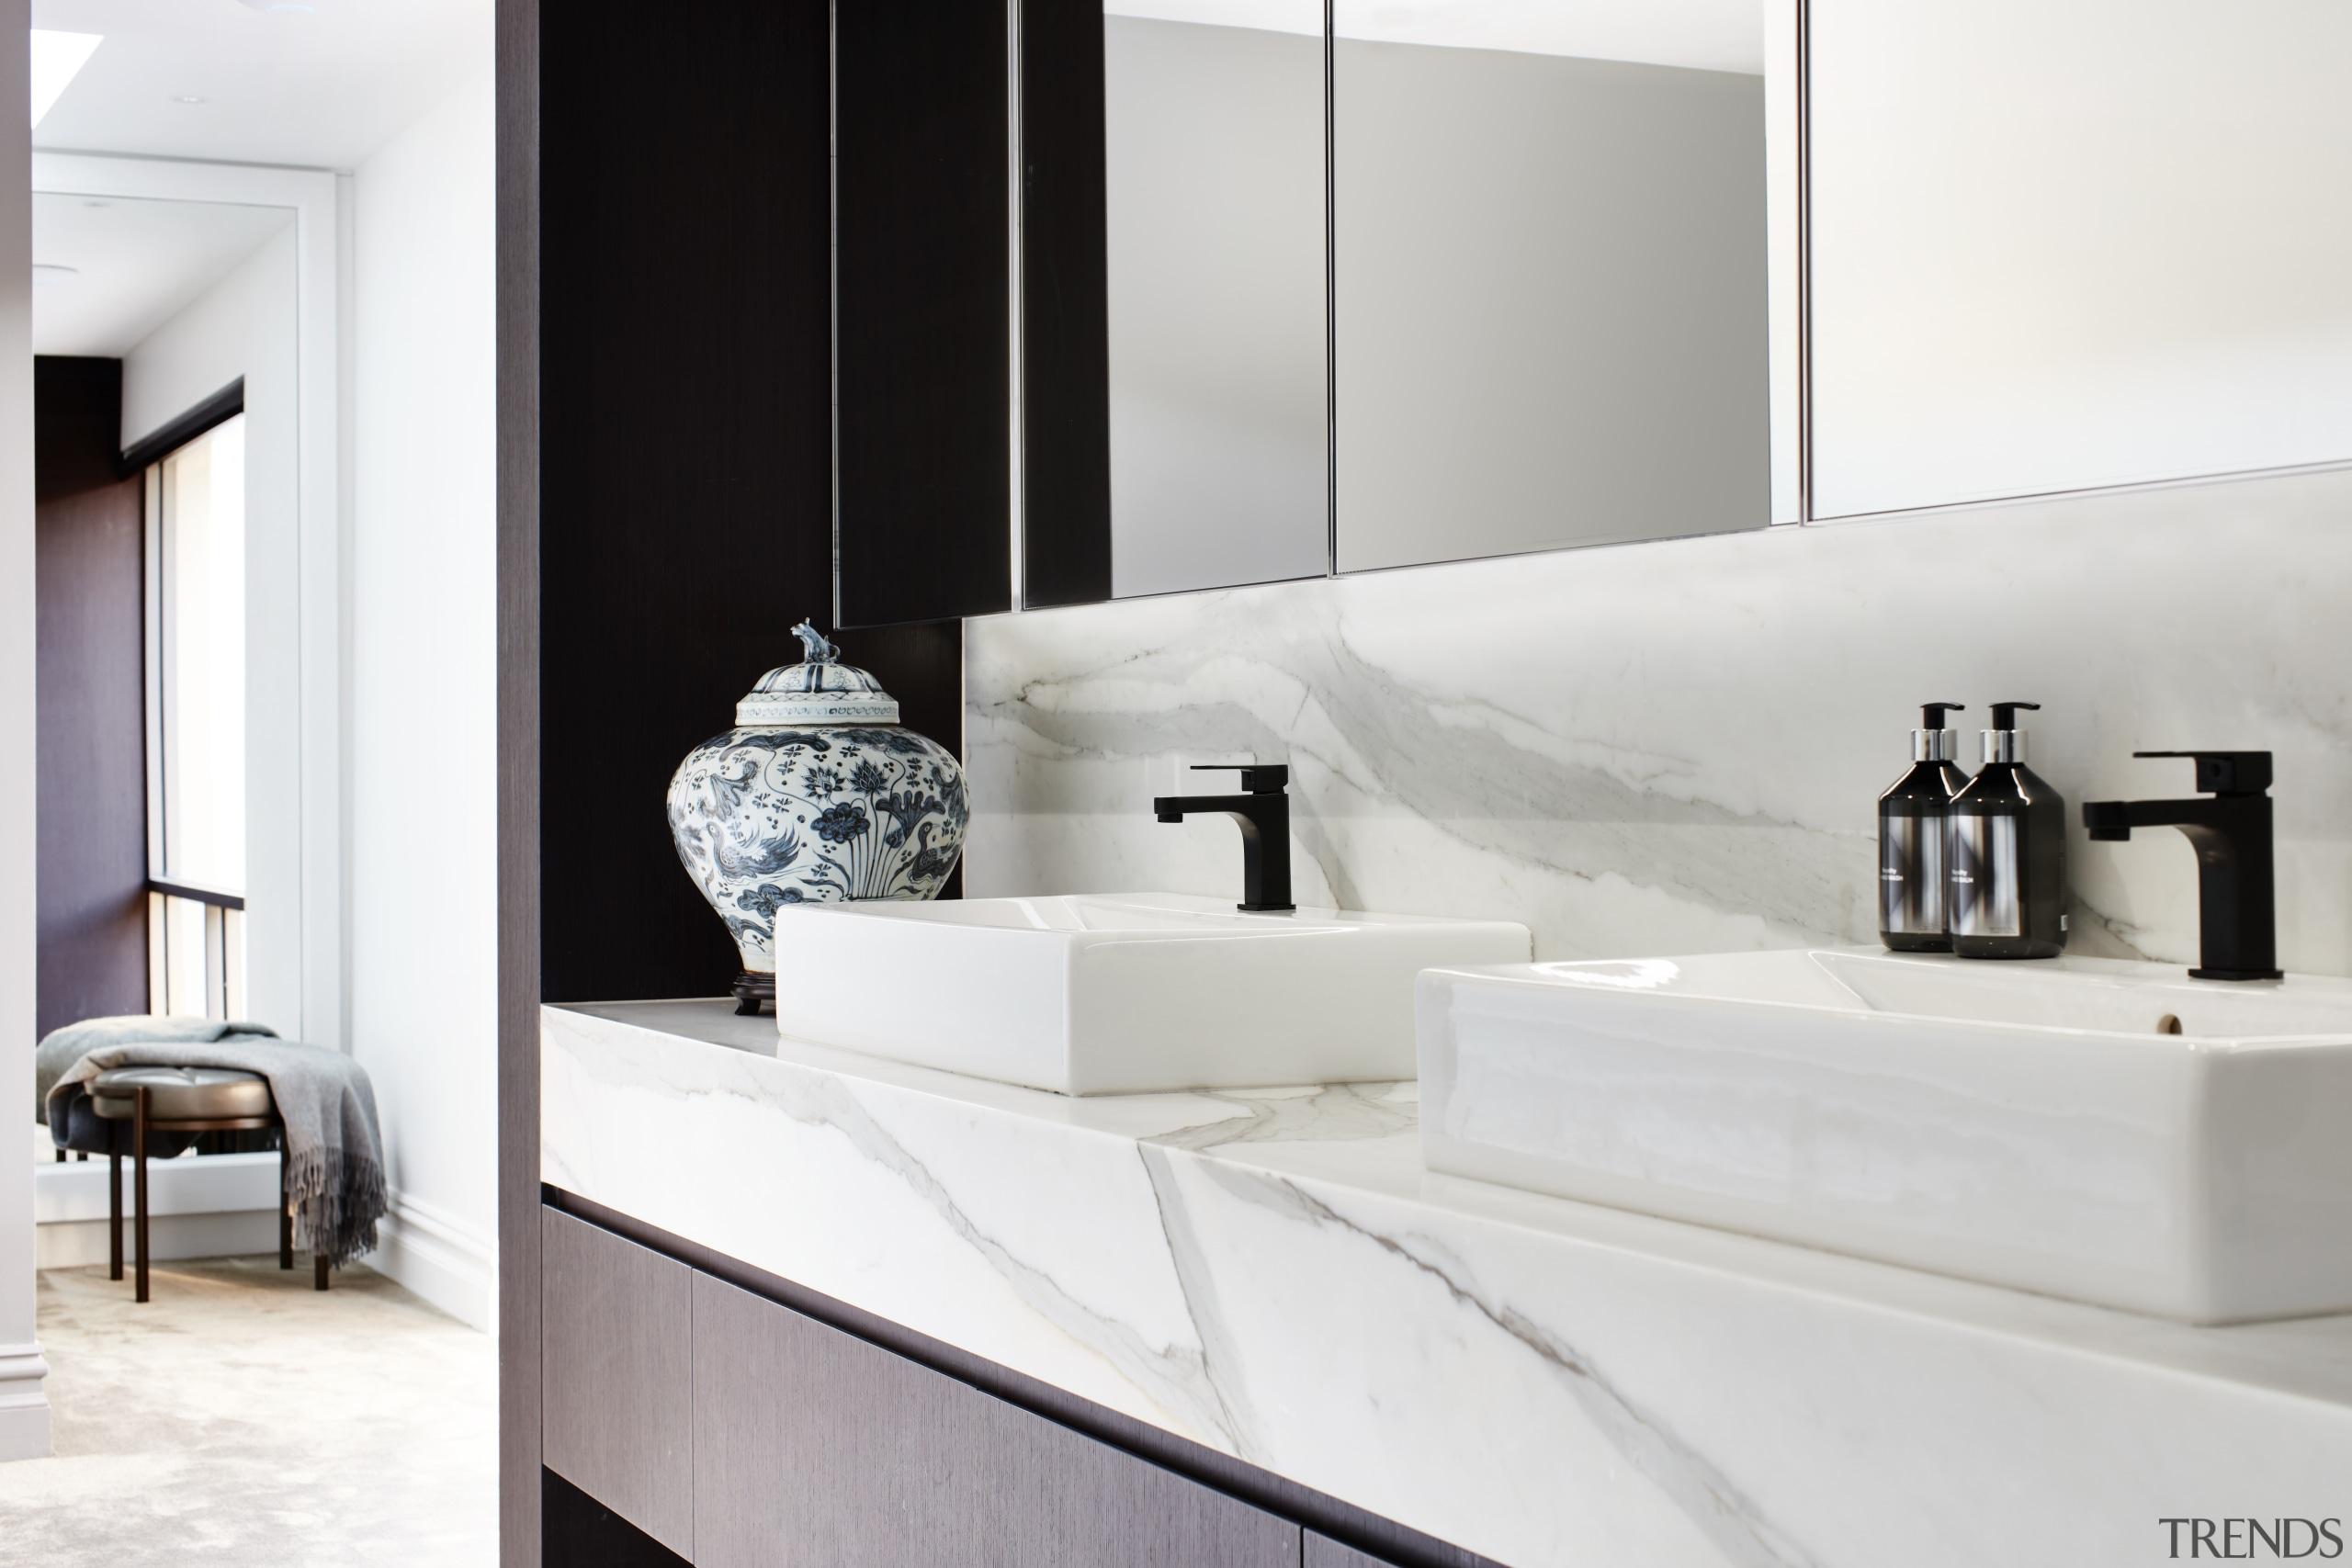 Traditional urn, modern black tapware – this is architecture, bathroom, bathroom accessory, bathroom cabinet, black tapware, black-and-white, countertopmarble, Archer Design